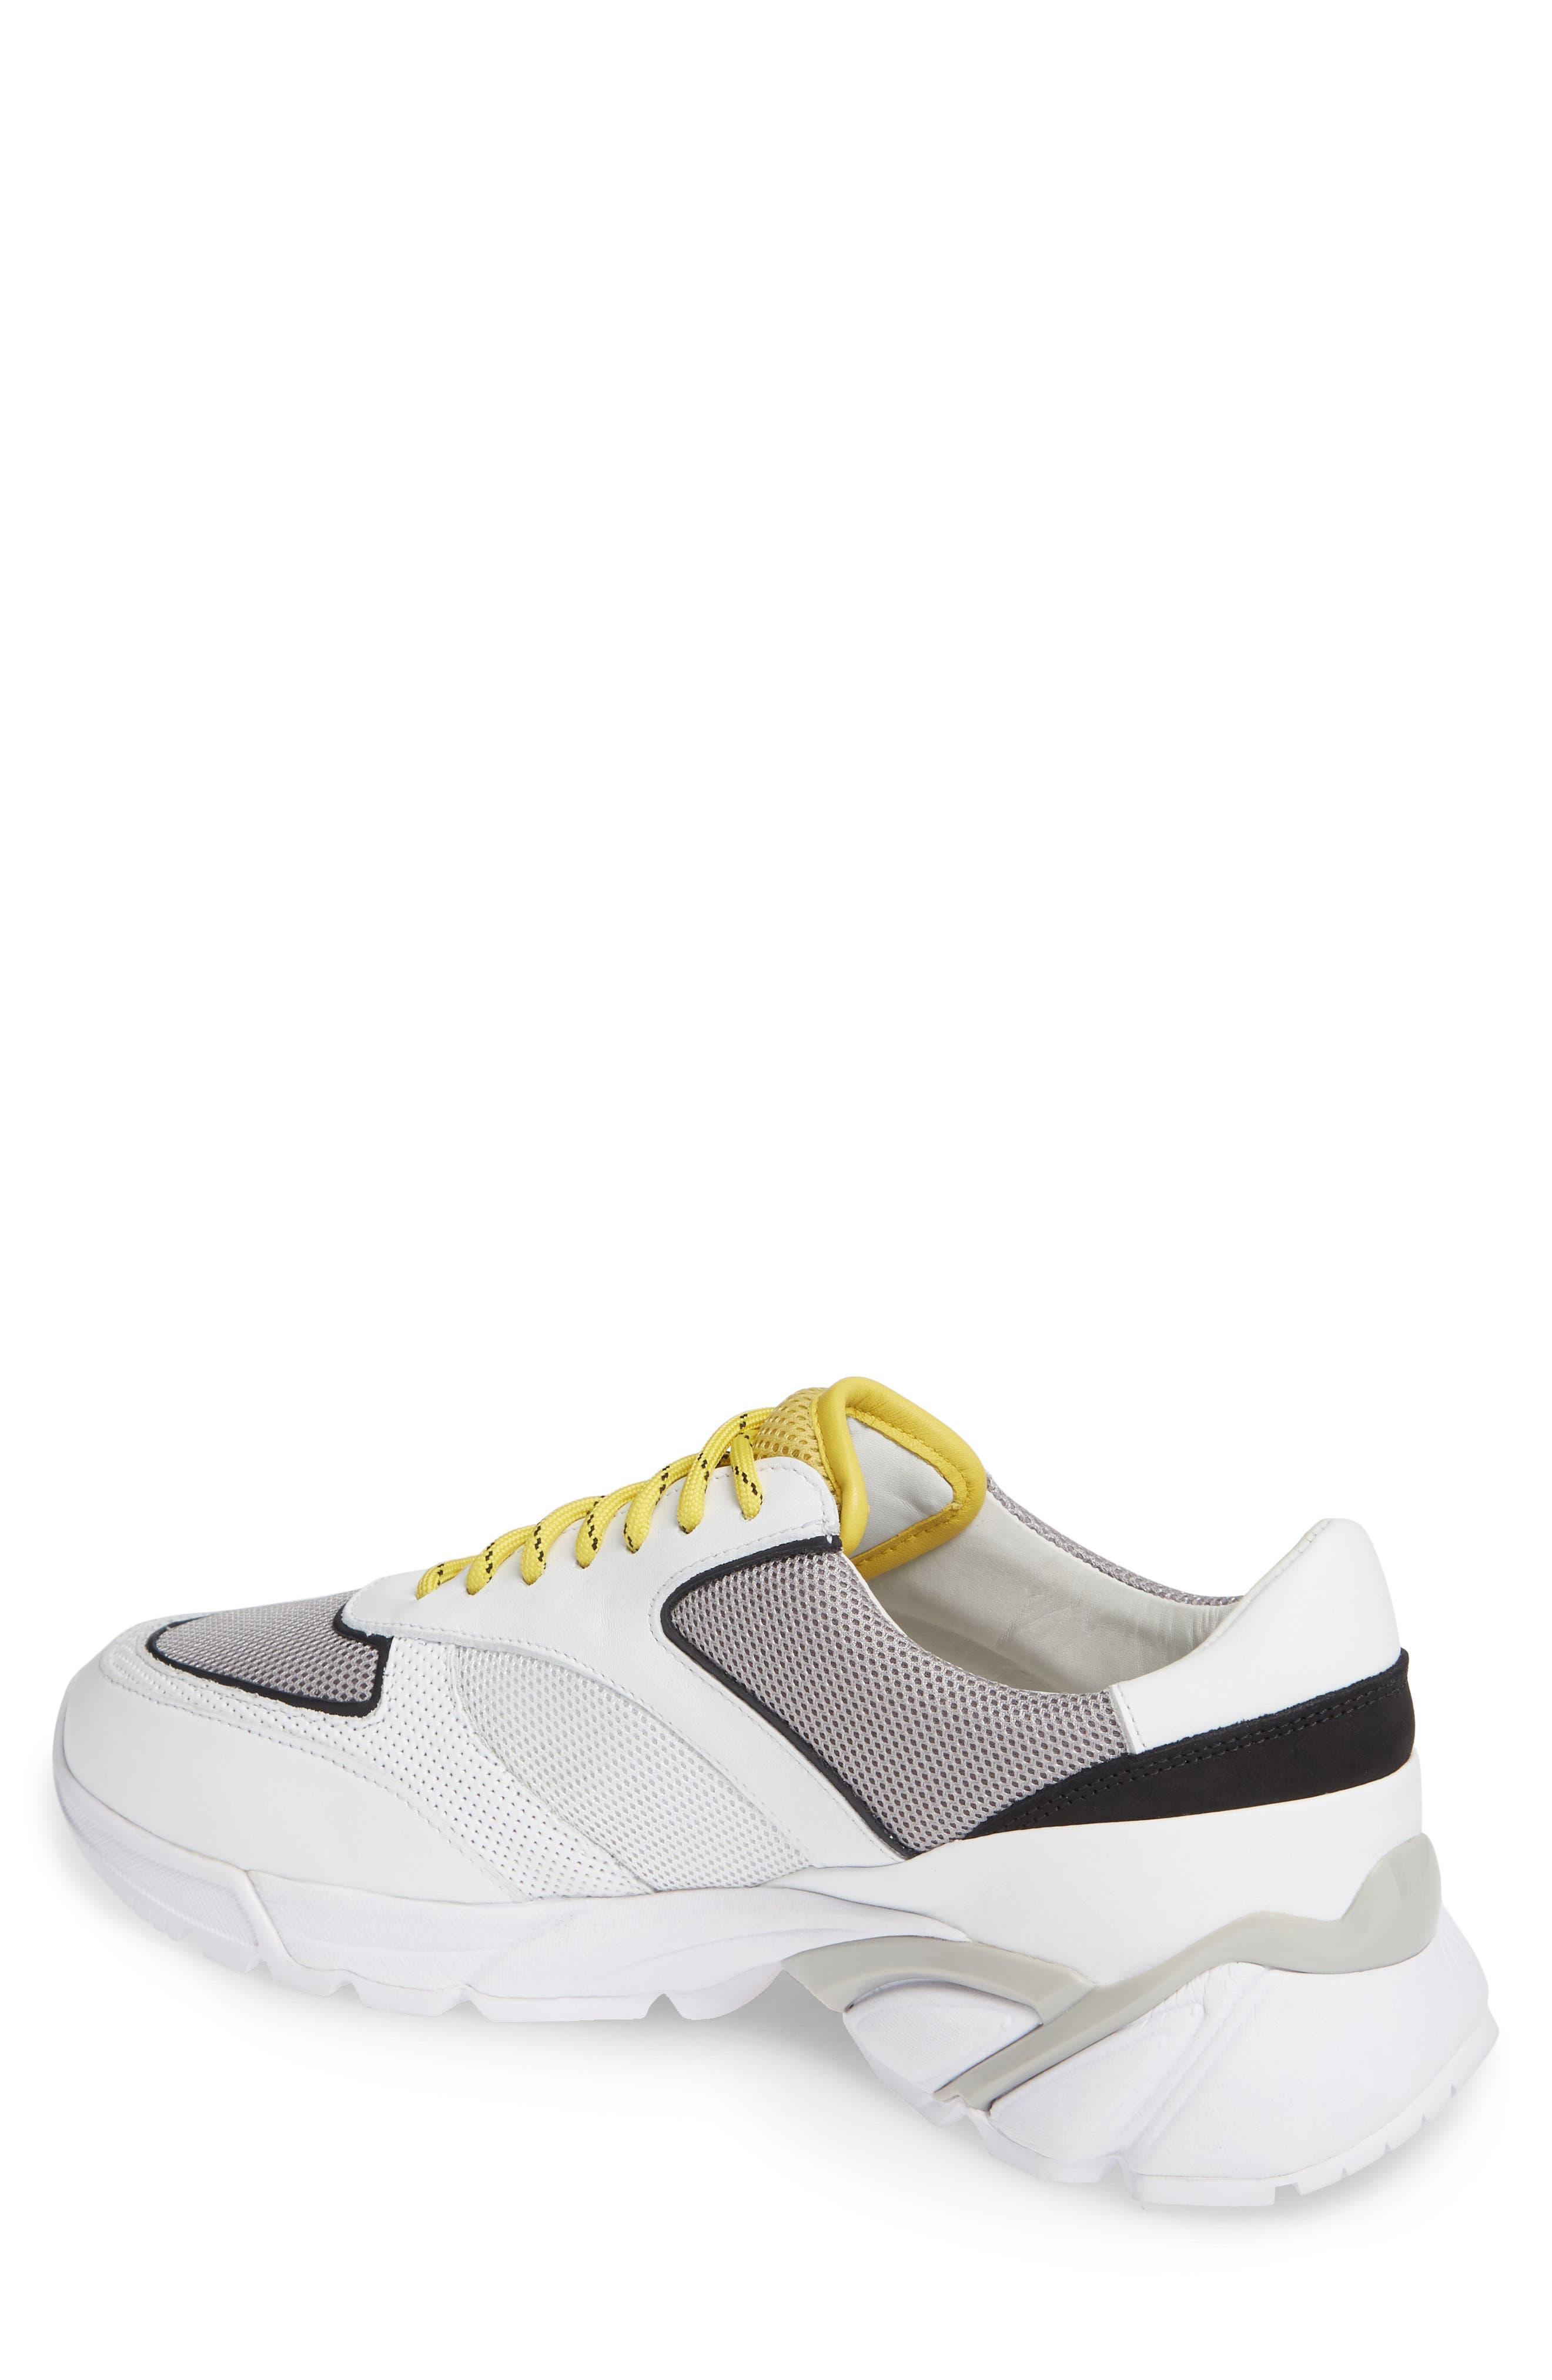 Tech Sneaker,                             Alternate thumbnail 2, color,                             100